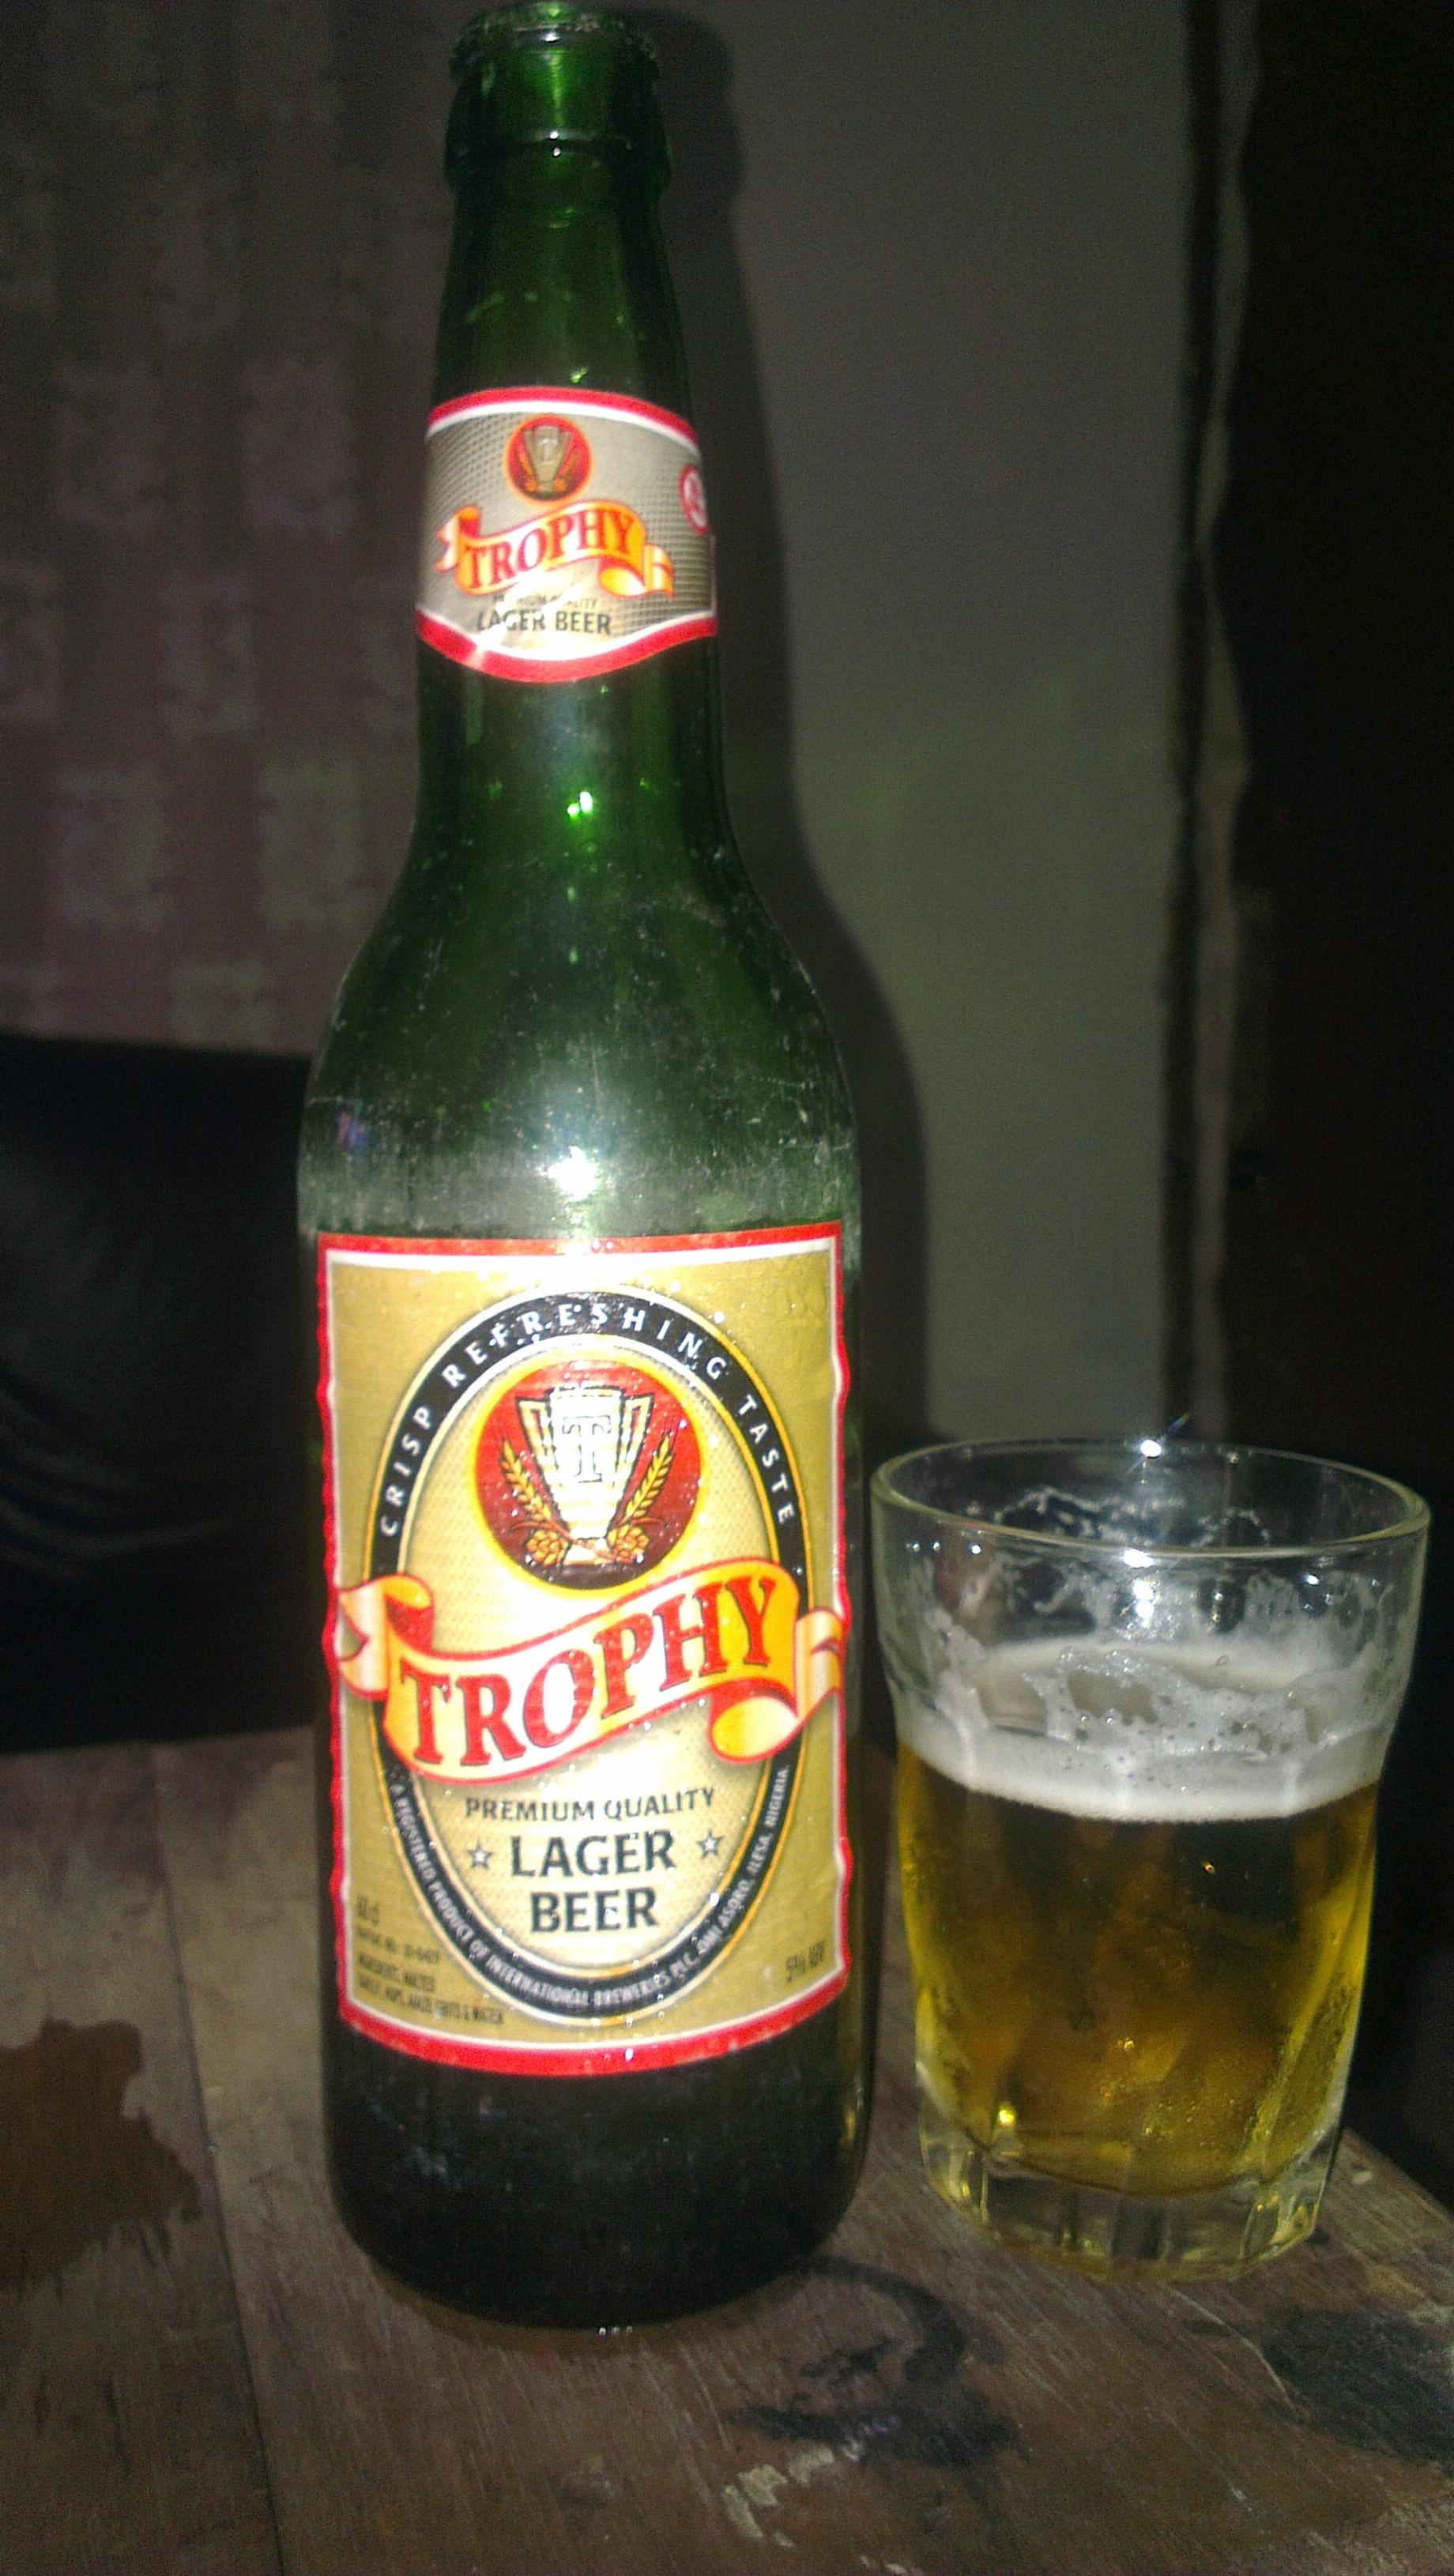 77ebf887 Trophy Premium Quality Lager Beer • RateBeer